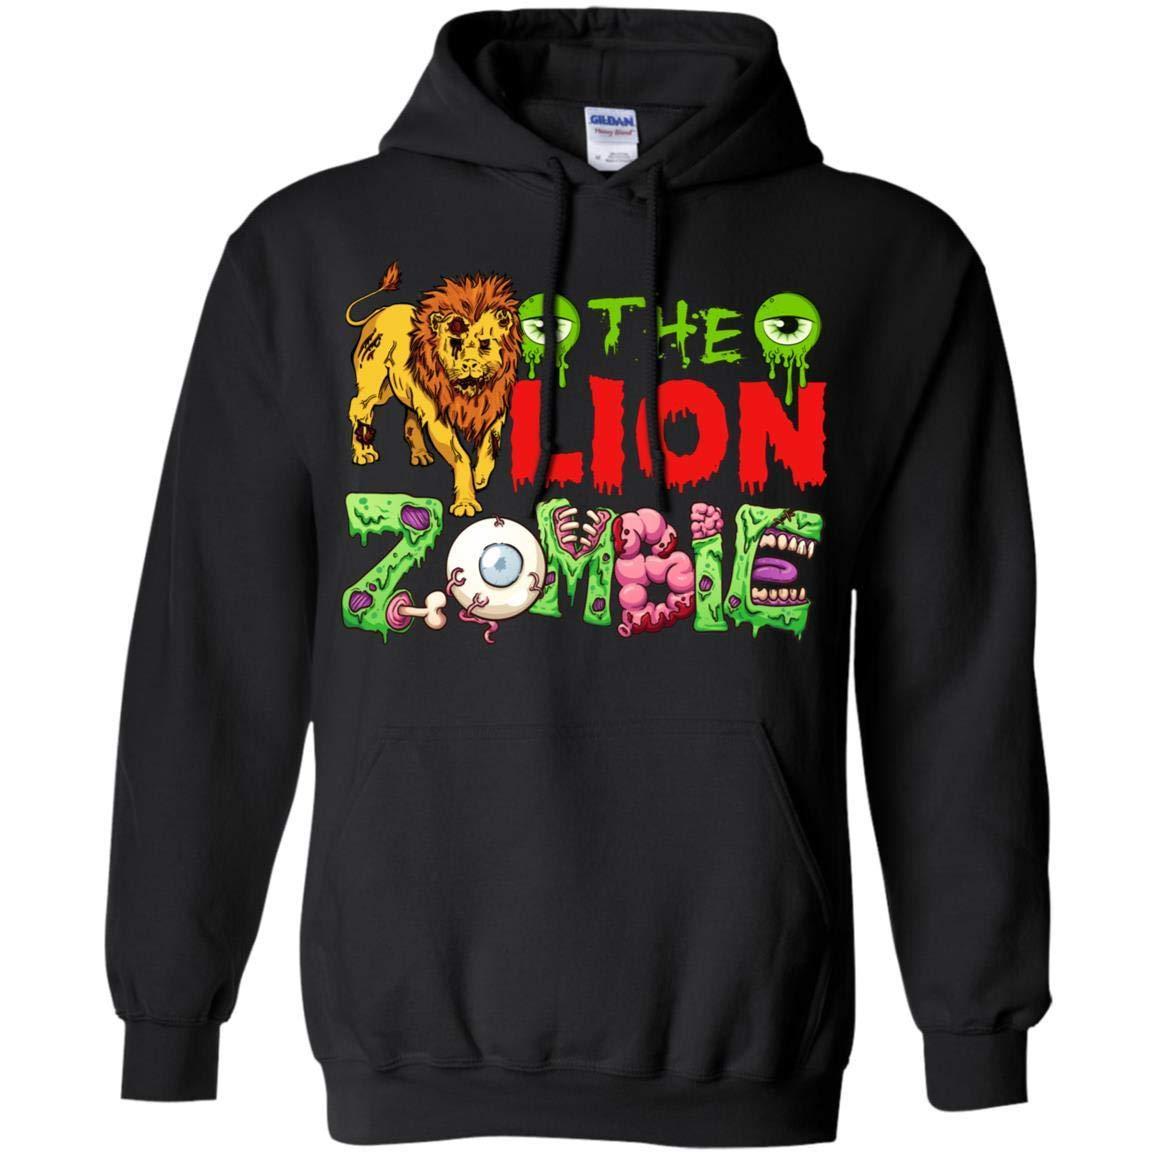 Family Gift Tee Store Lion Zombie Halloween Shirt